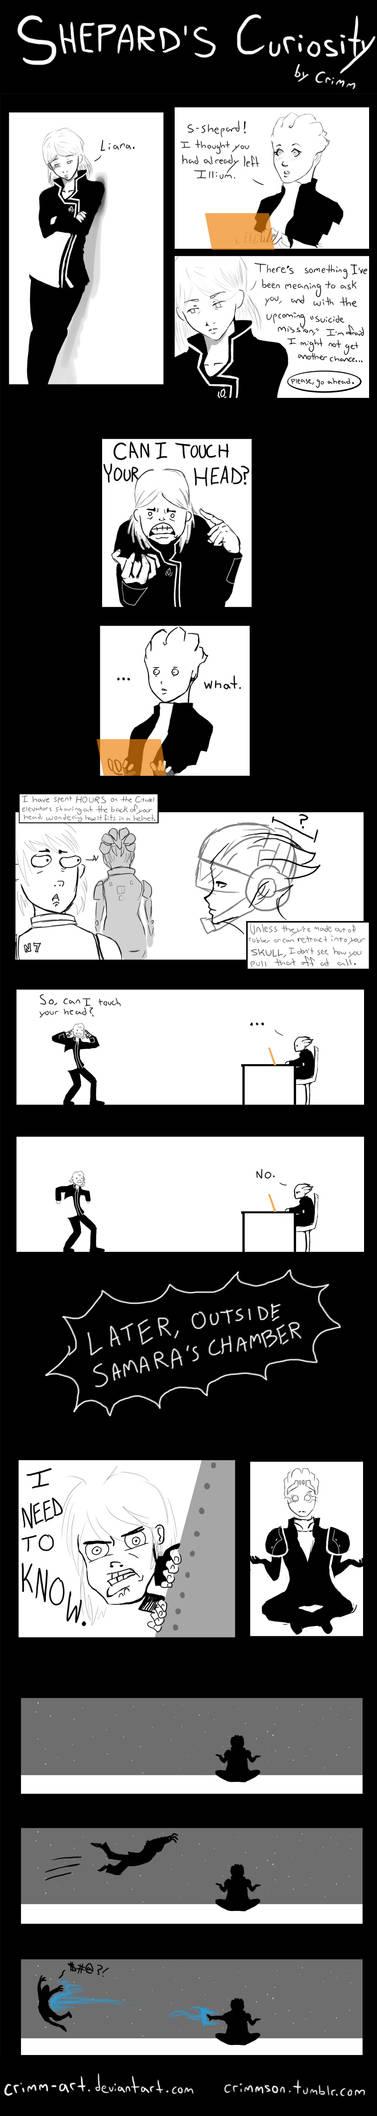 Shepard's Curiosity by Crimm-Art